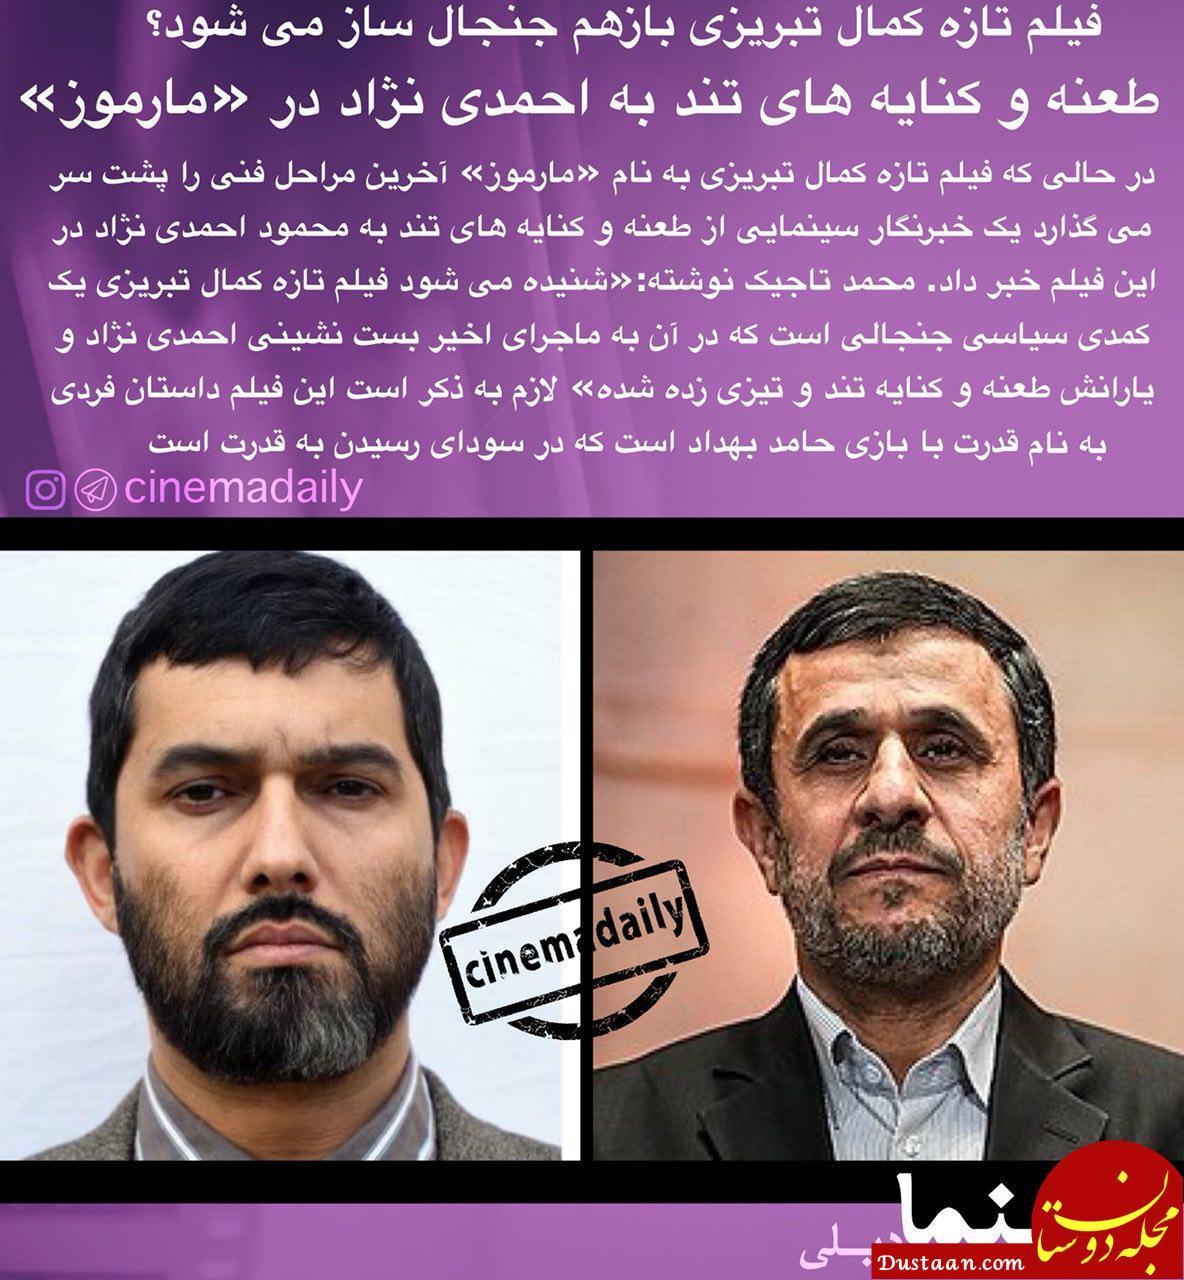 www.dustaan.com طعنه و کنایه های تند به محمود احمدی نژاد در فیلم تازه کمال تبریزی!